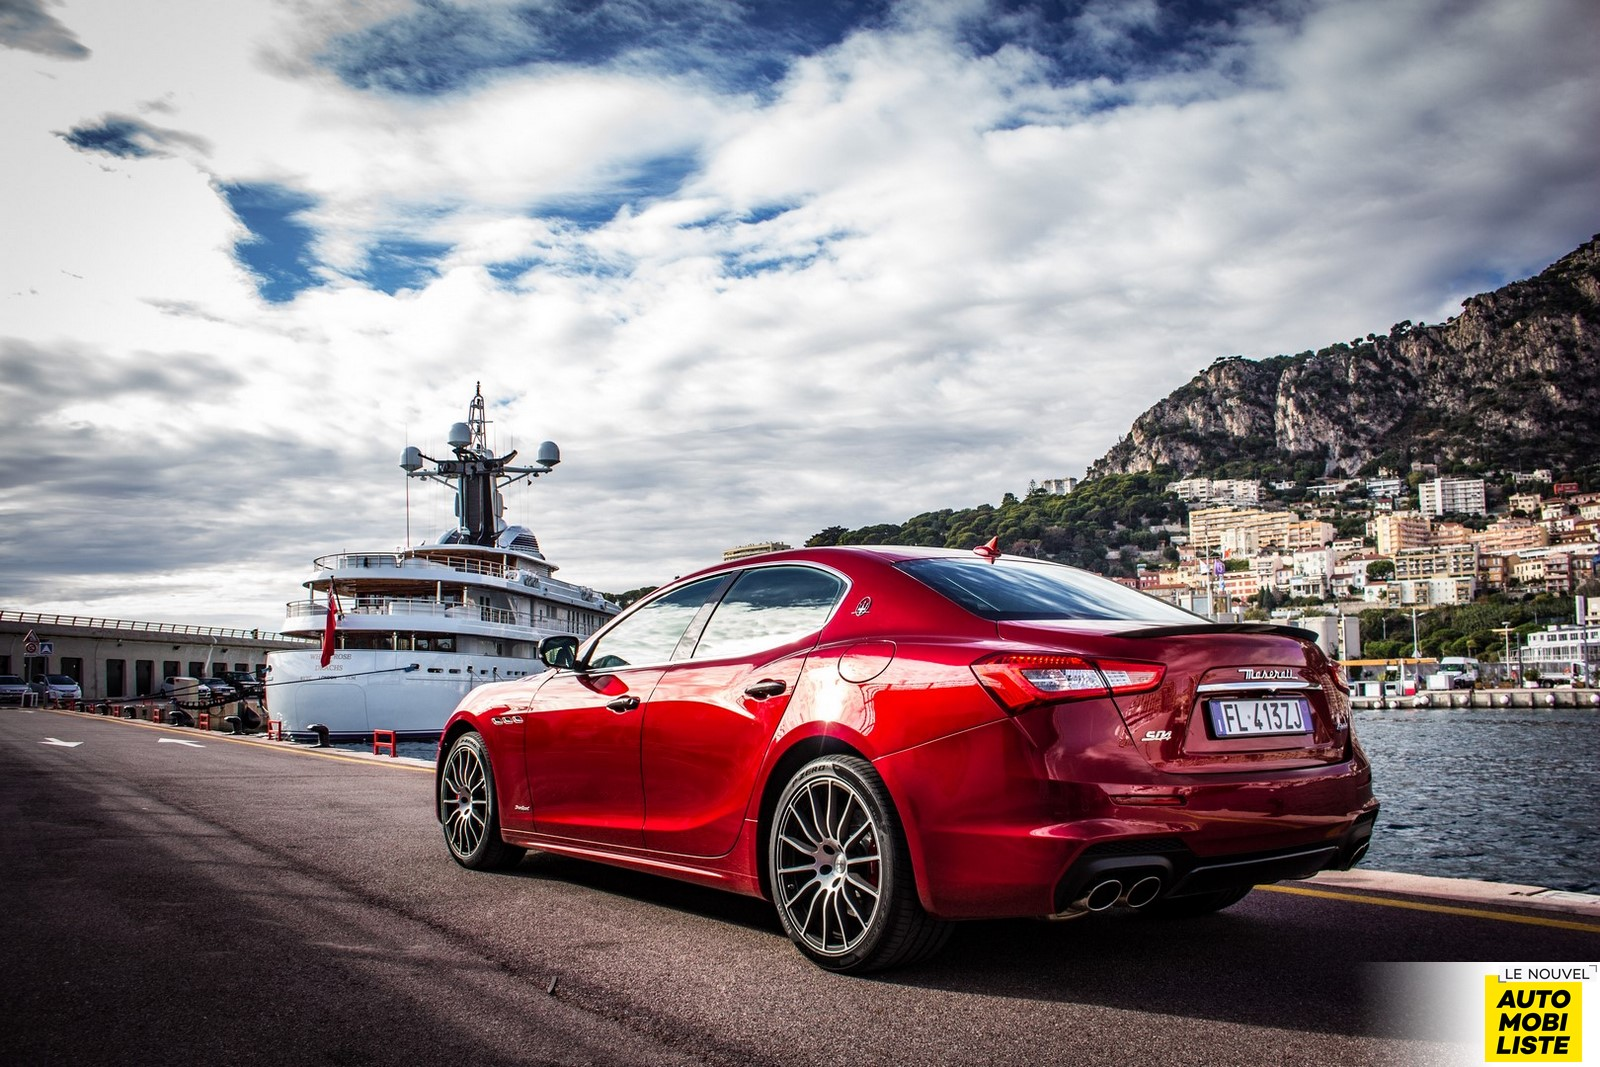 Essai Maserati Ghibli SQ4 2018 LeNouvelAutomobiliste 321